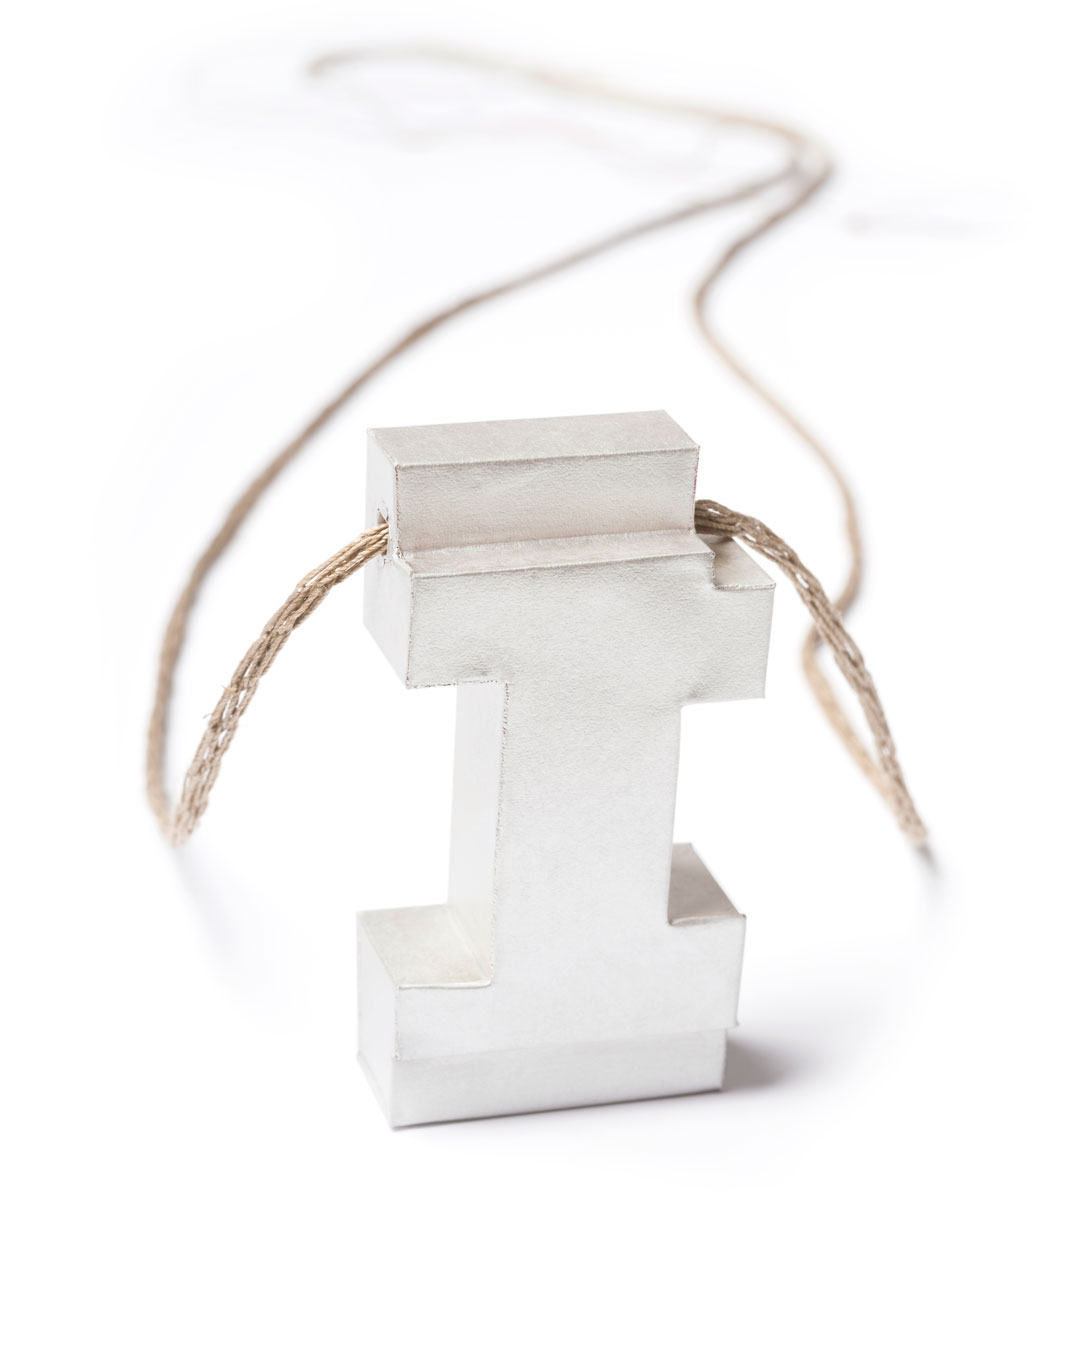 Carla Nuis, Unfurl 7, 2018, pendant; fine silver, linen, 58 x 30 x 14 mm, €710